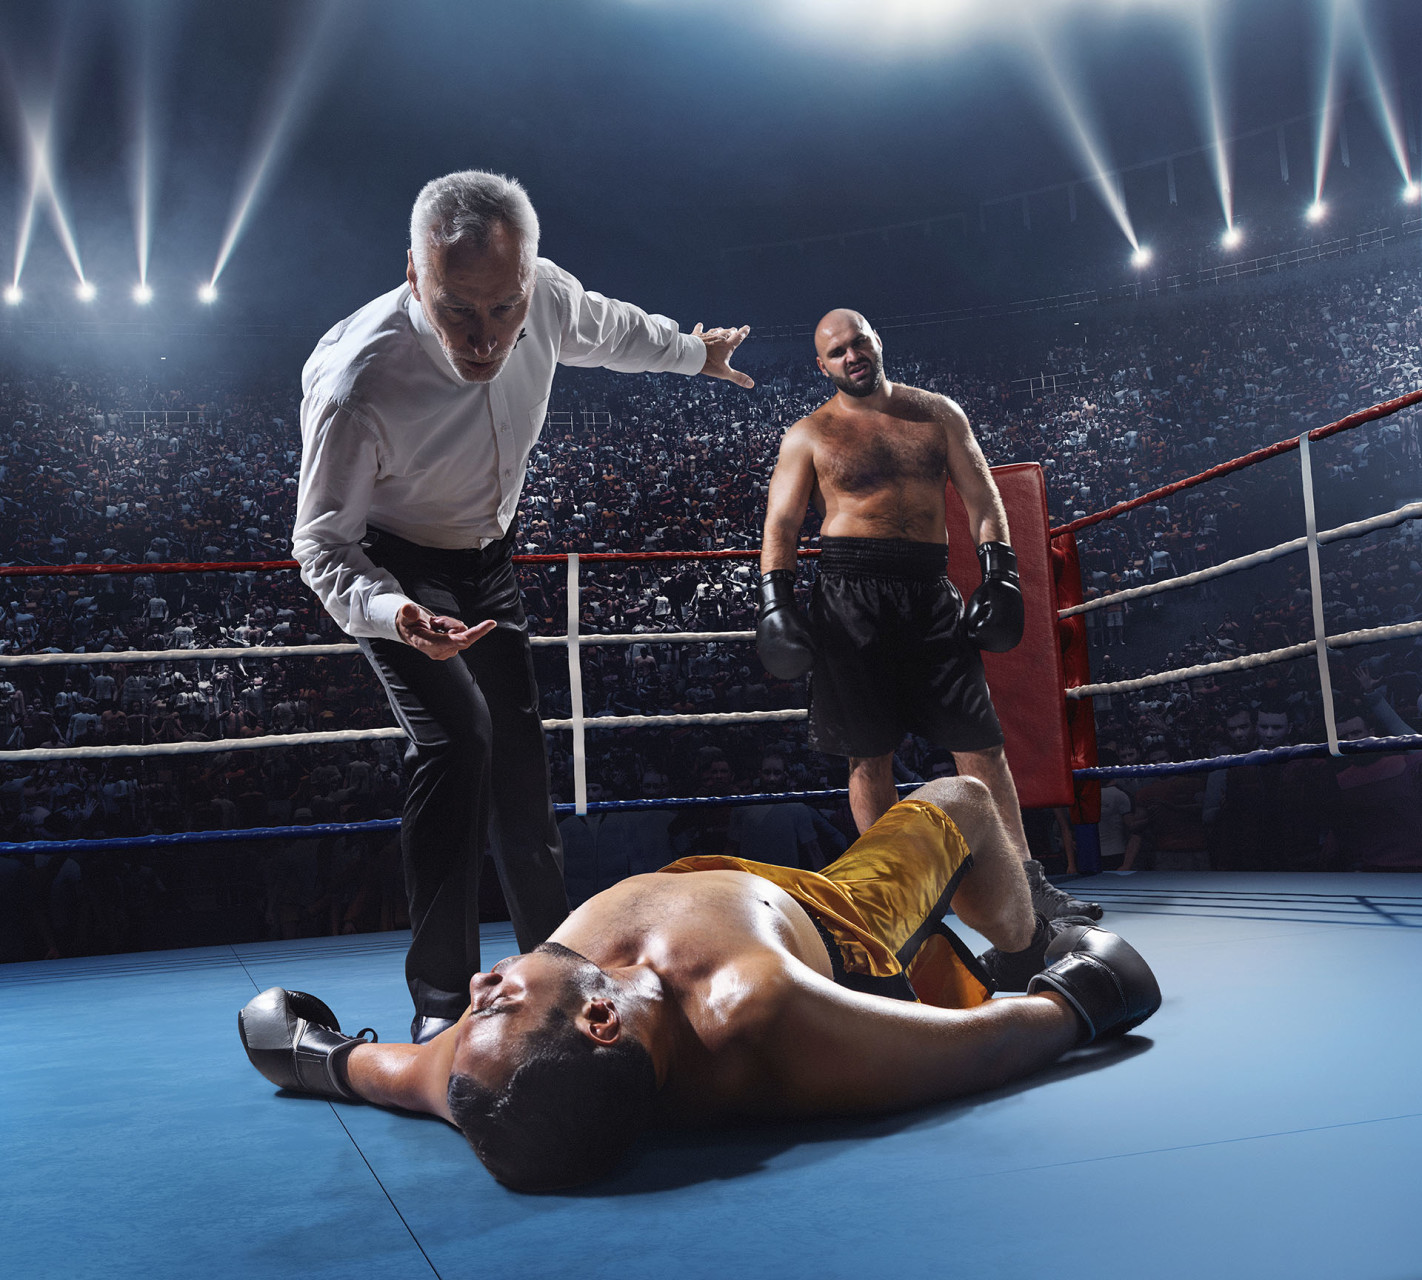 boxing_2016_cam1_2-1422x1280